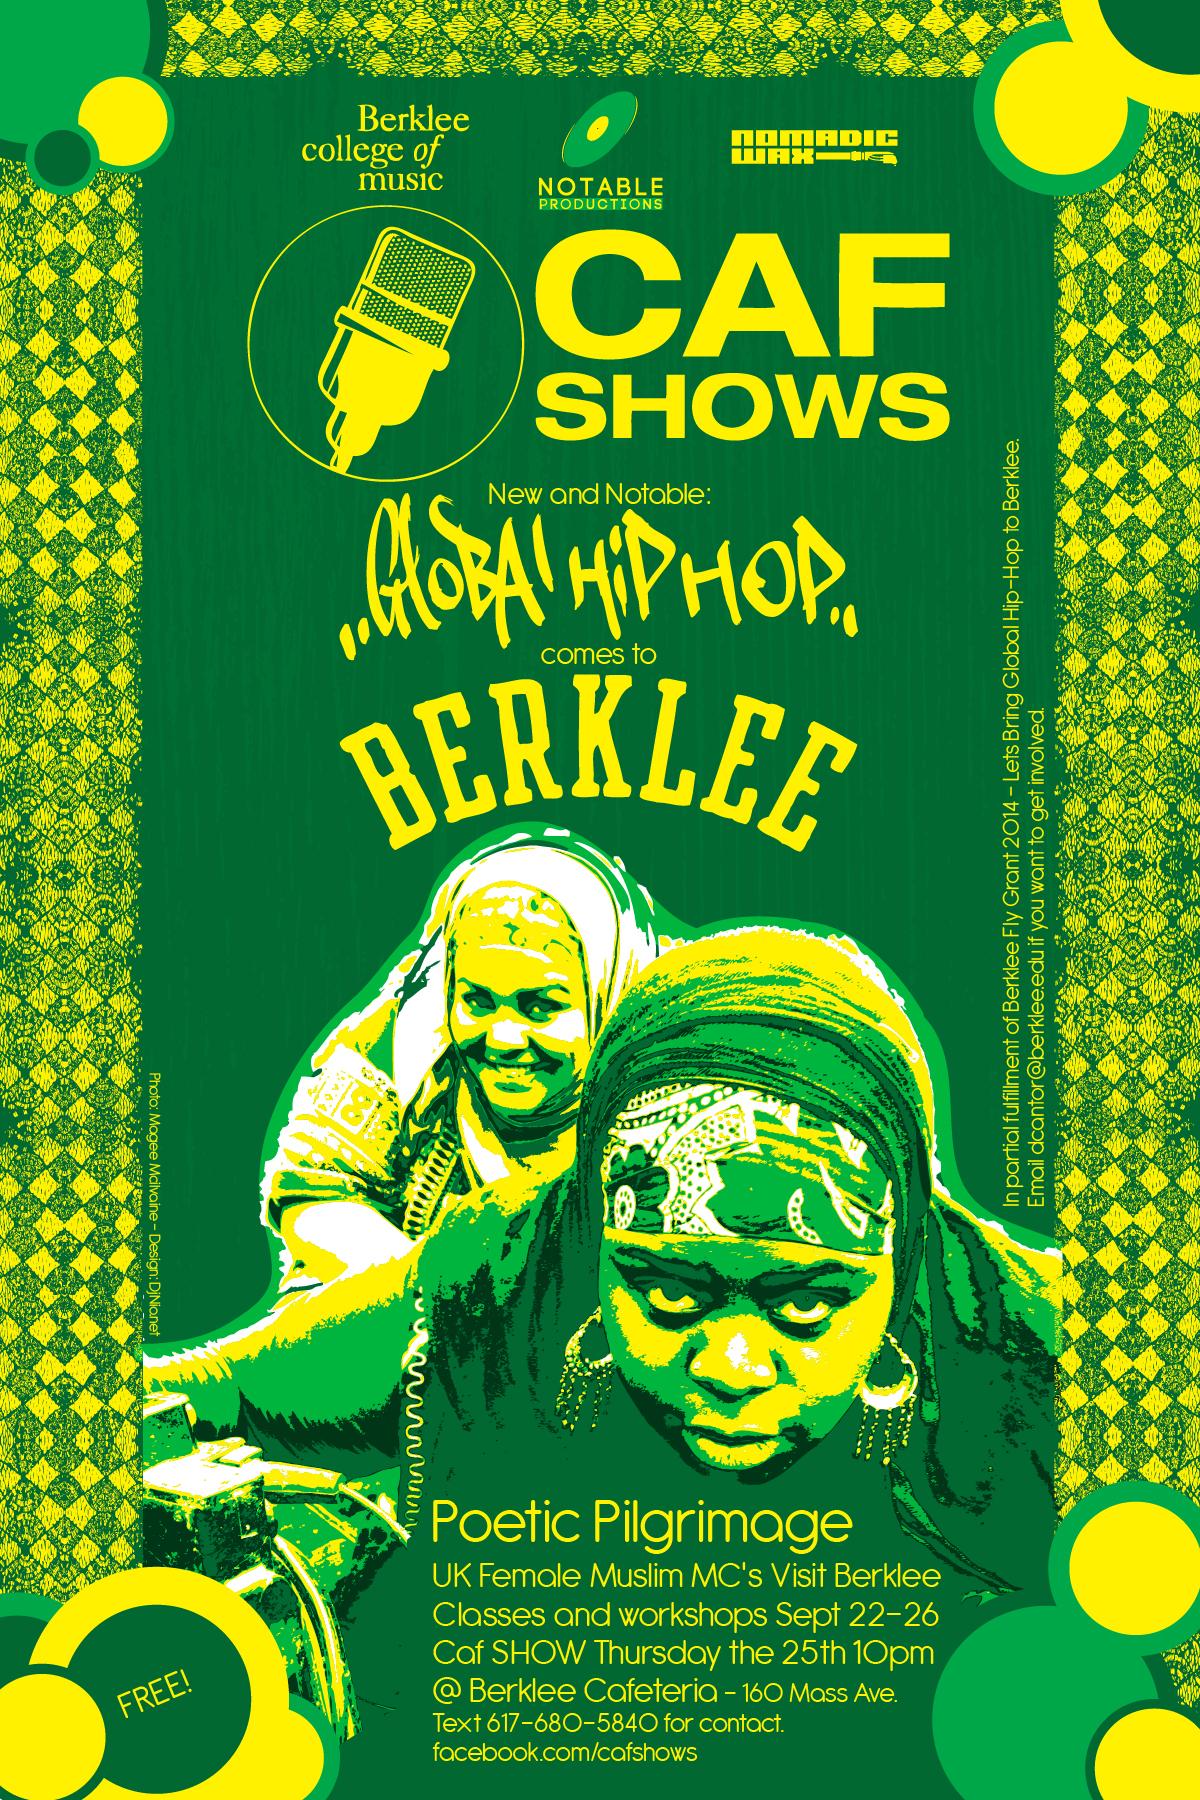 Global Hip Hop Event at Berklee College